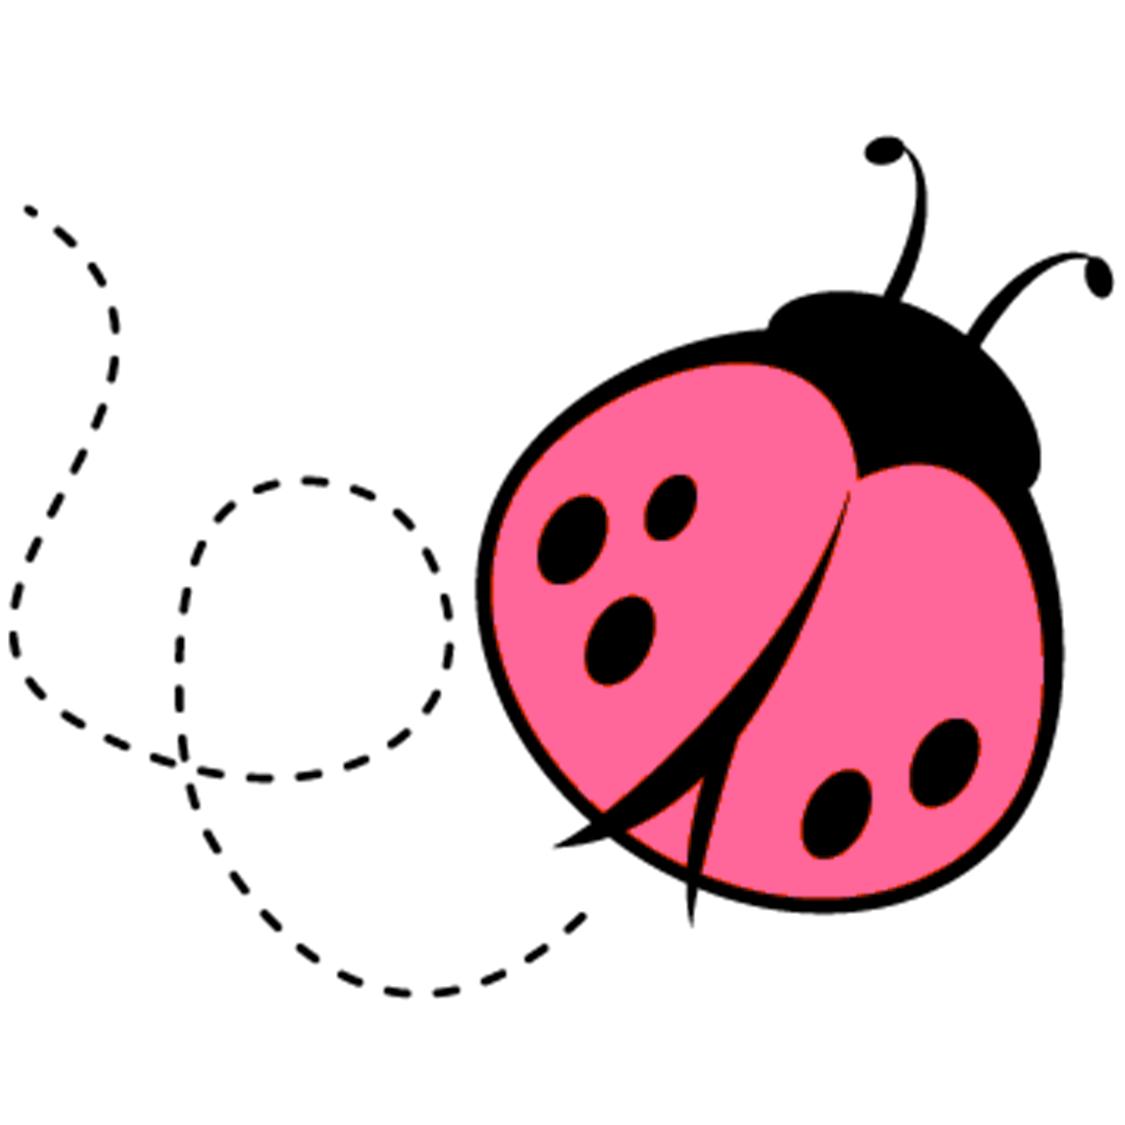 1125x1125 Complete Ladybug Template Fun Stuff To Do